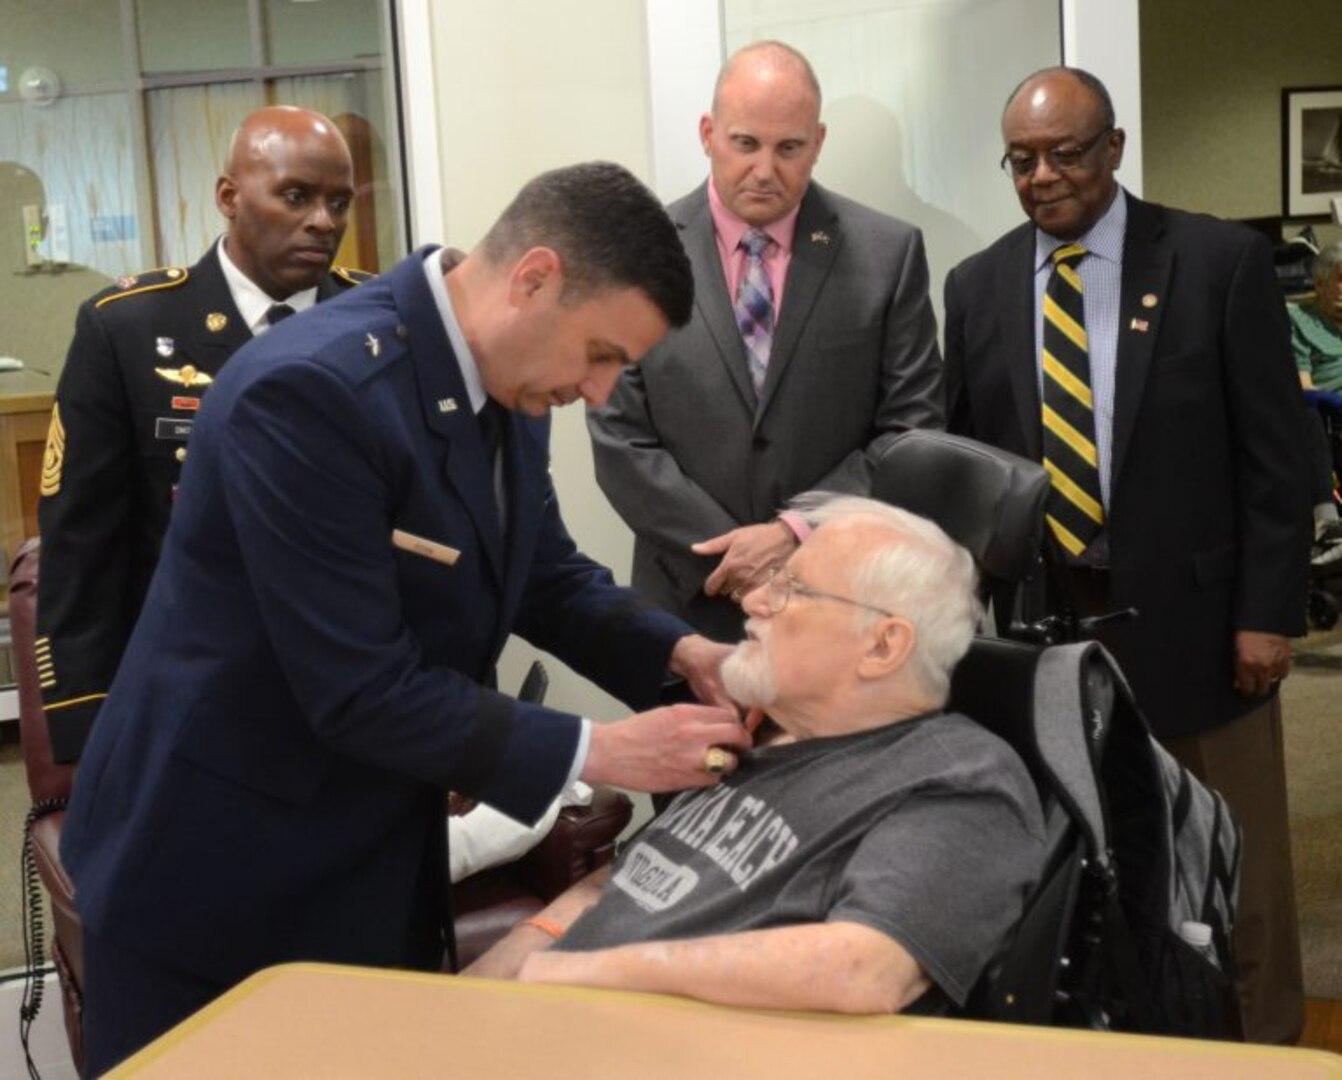 Virginia's vets honored on National Vietnam Veterans Day